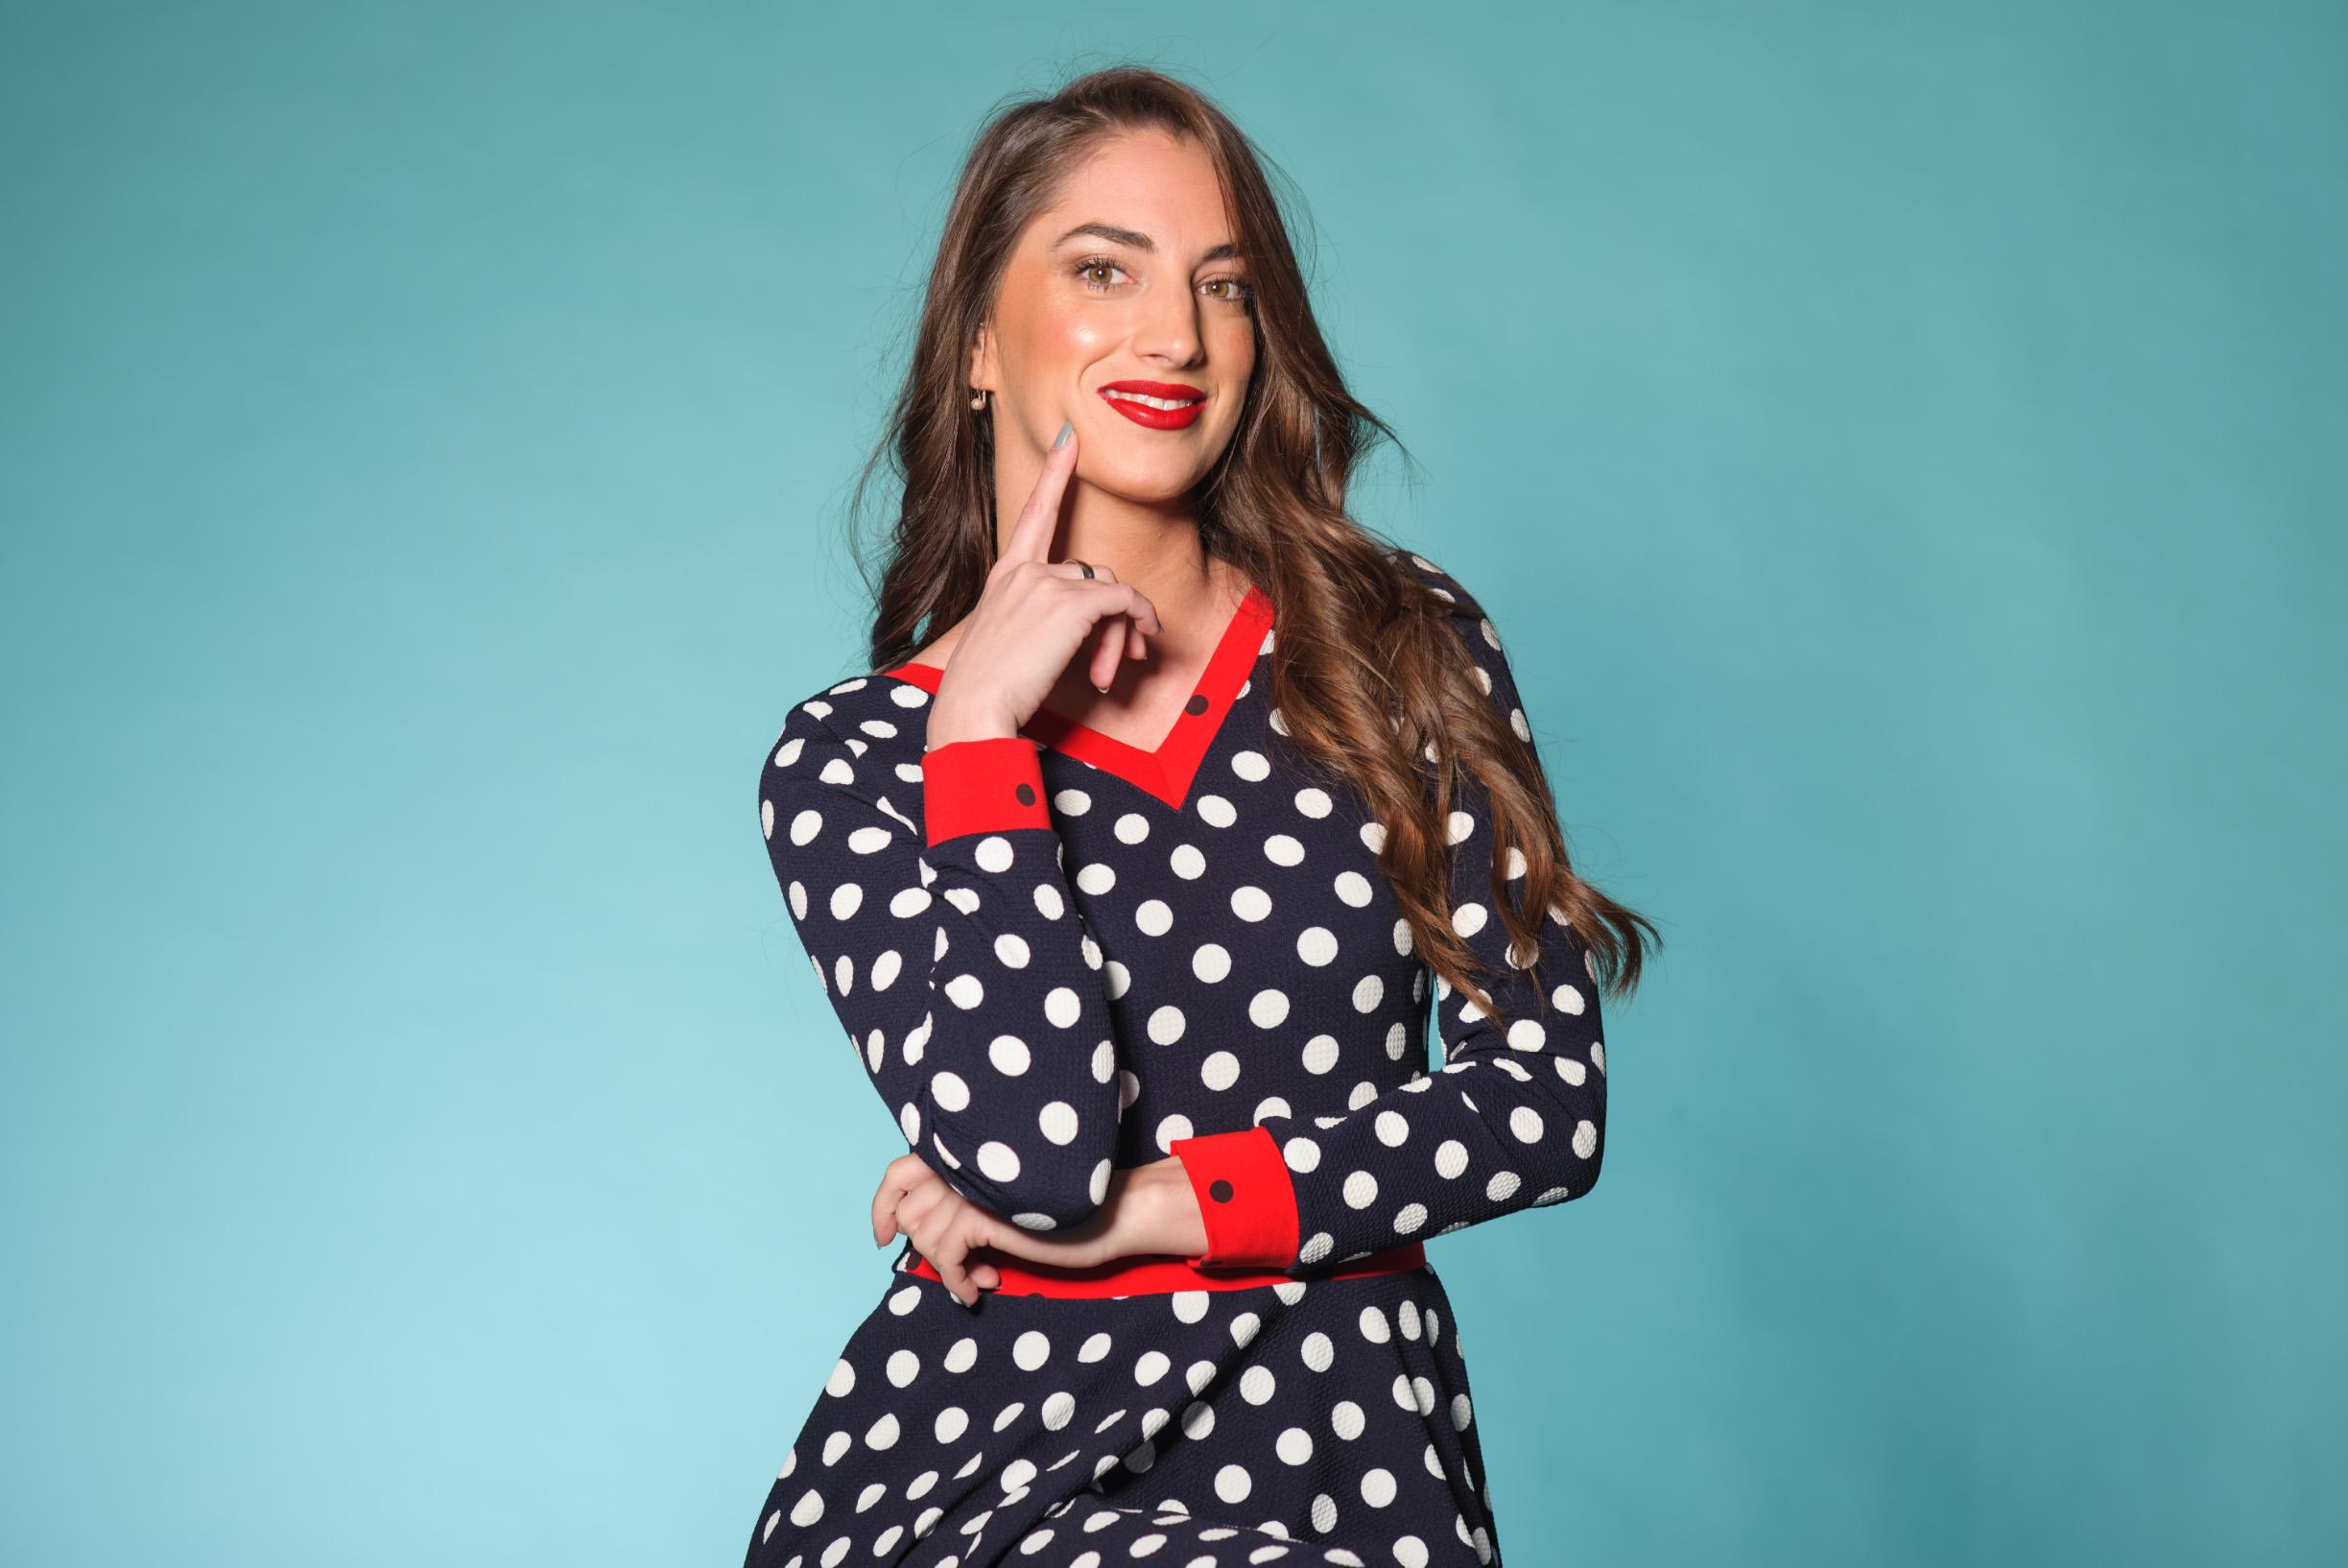 Manuela Svorcan_110319_32